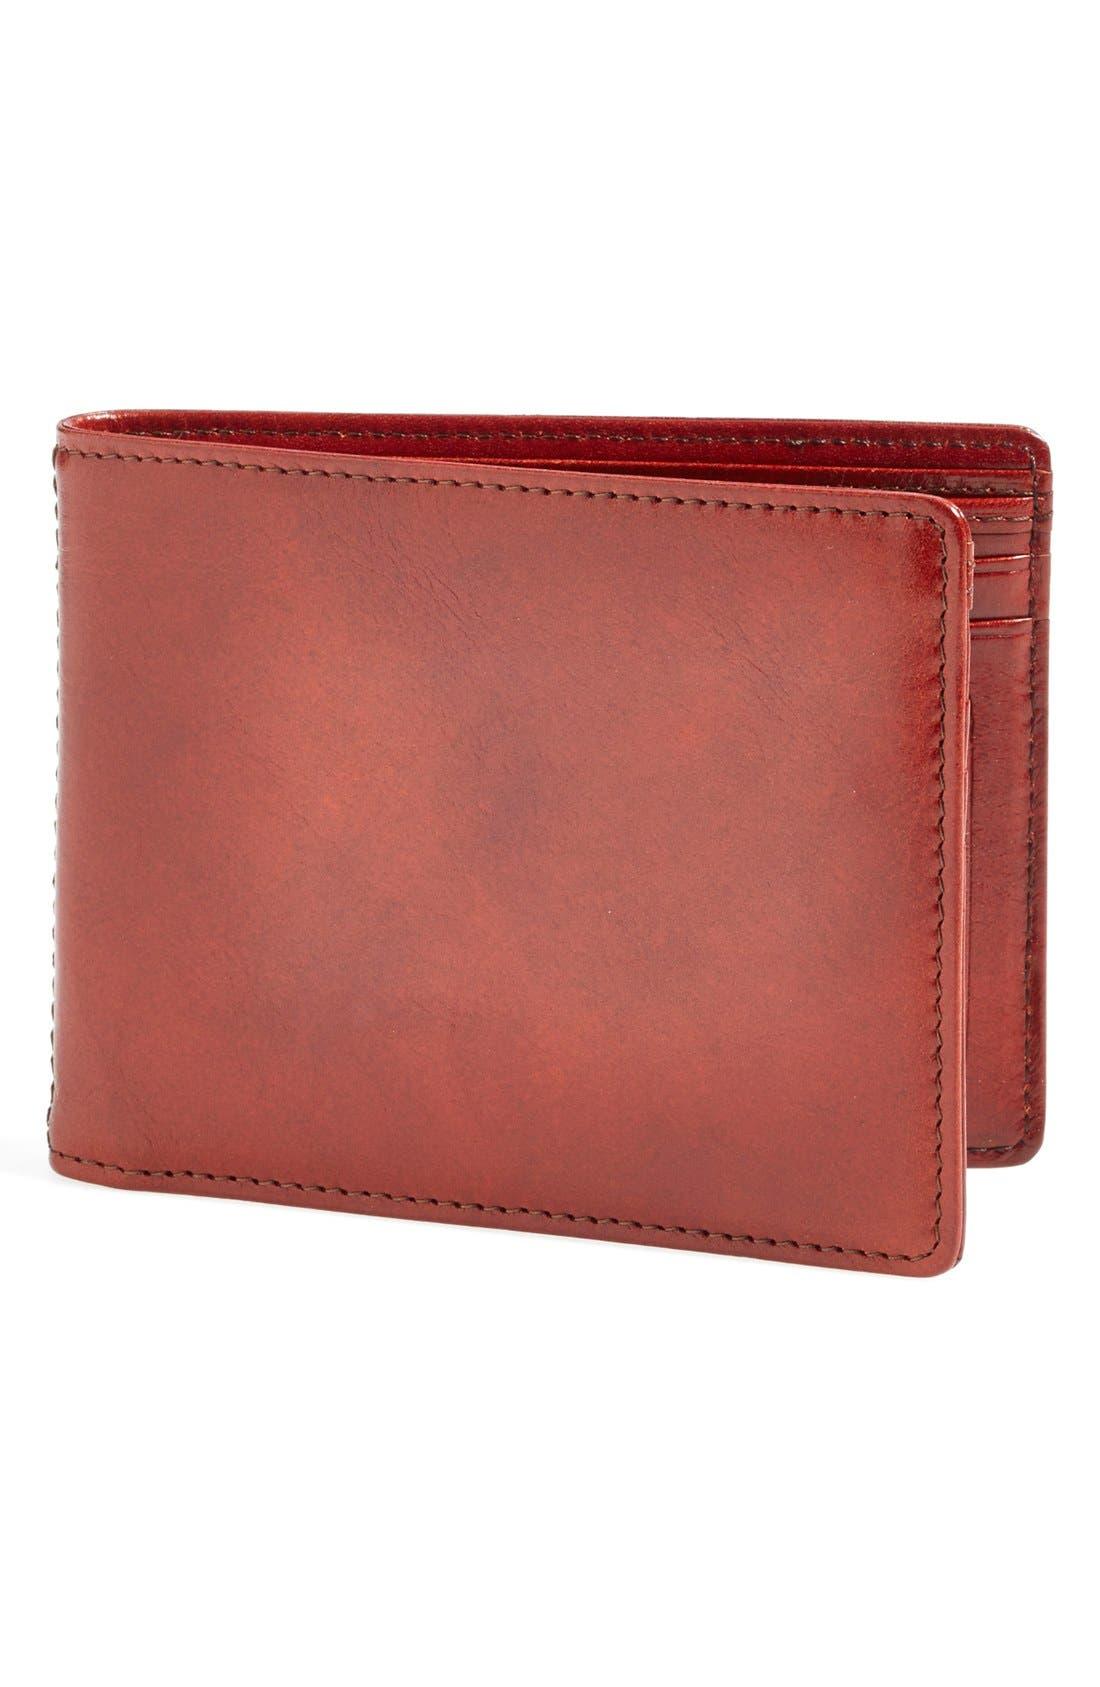 Alternate Image 1 Selected - Bosca 'Old Leather' Bifold Wallet